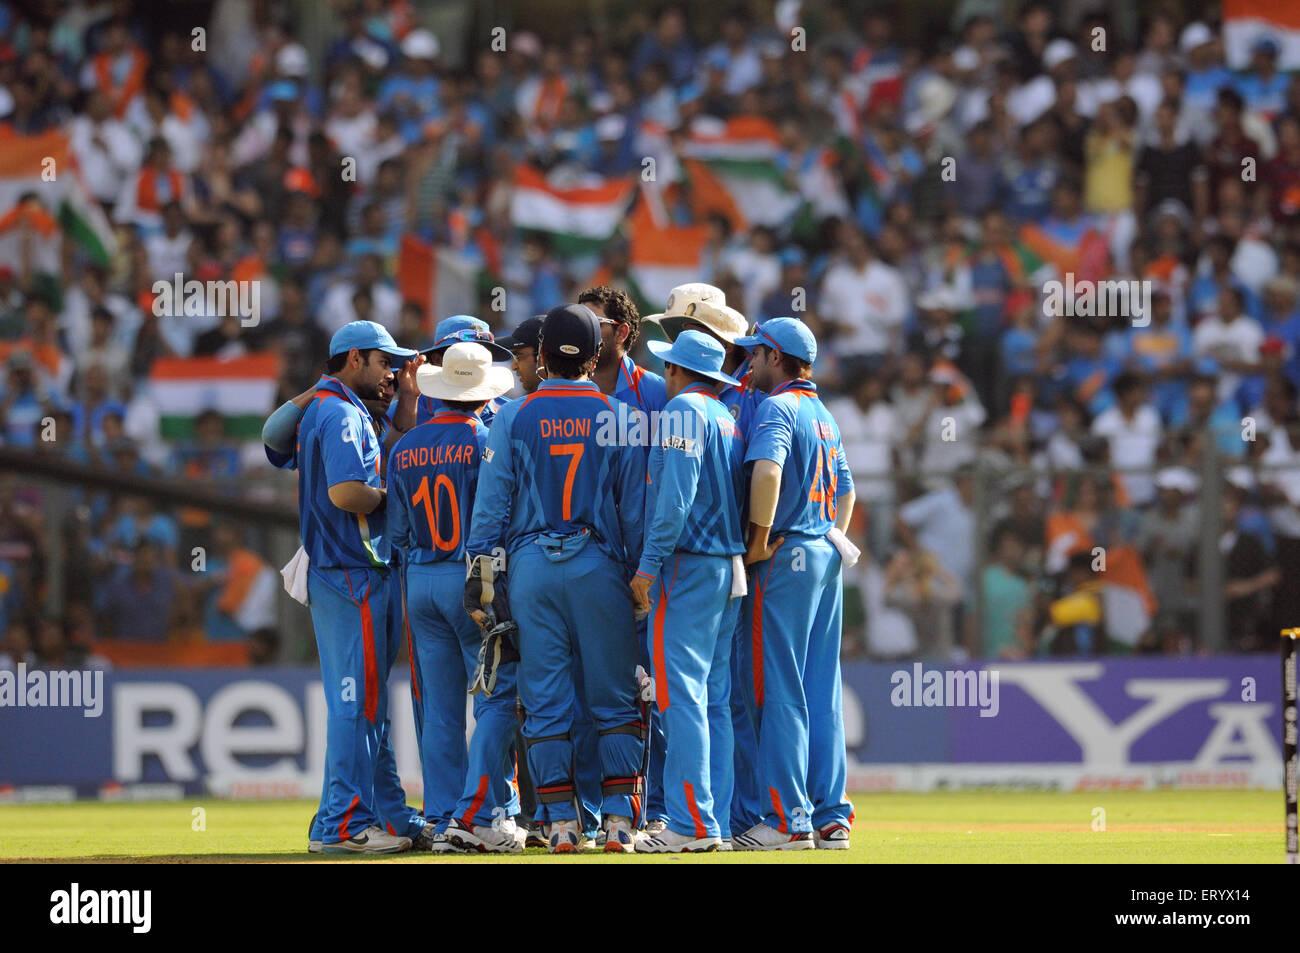 cricket team ICC Cricket World Cup finals against Sri Lanka played Wankhede stadium Mumbai - Stock Image